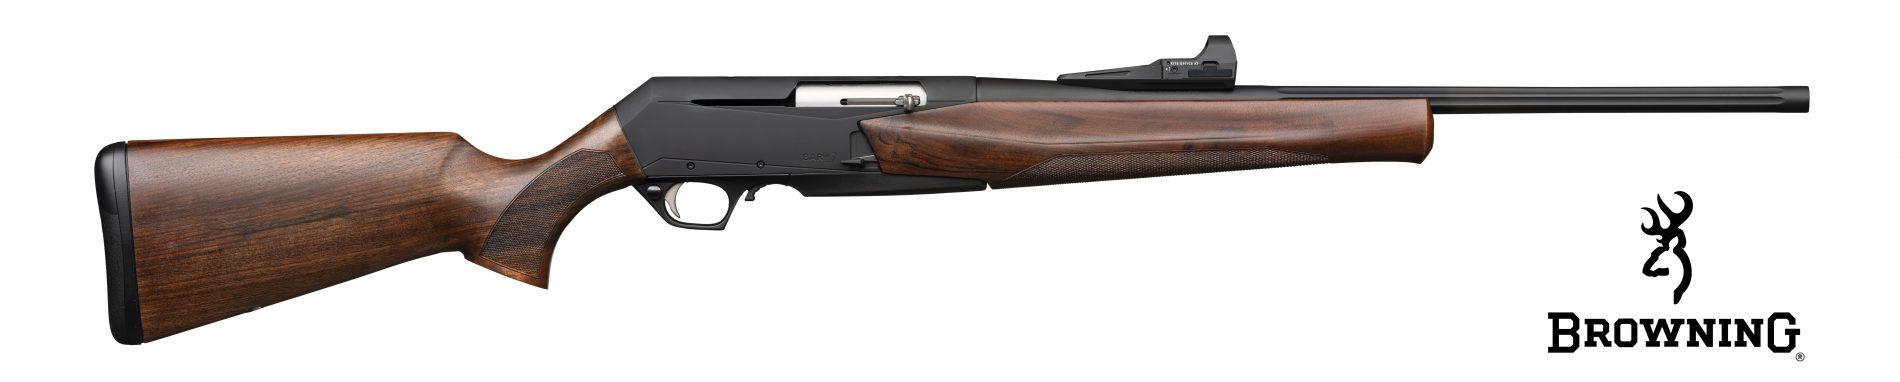 Nuevo rifle semiautomático: BAR MK3 REFLEX HUNTER